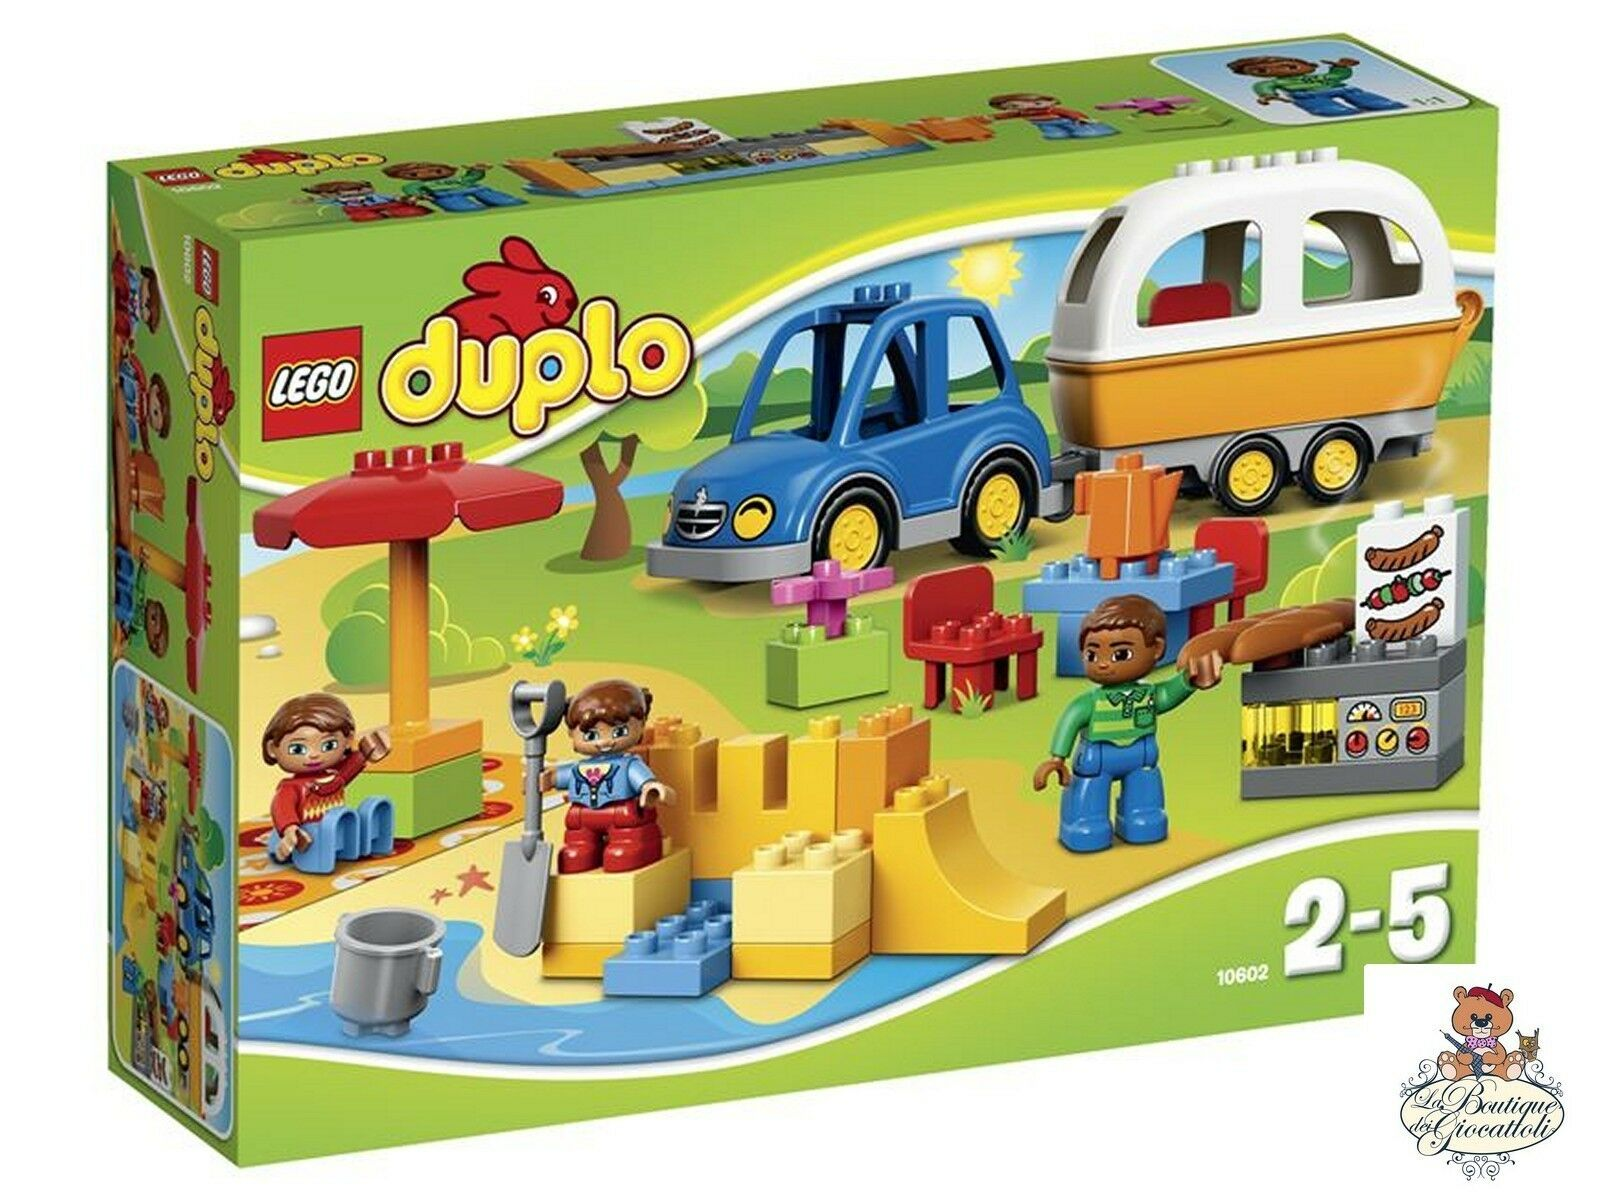 Jouets Et Campeggio Opsurr2378 Avventura In Lego 10602 Duplo Jeux QtrhdCs